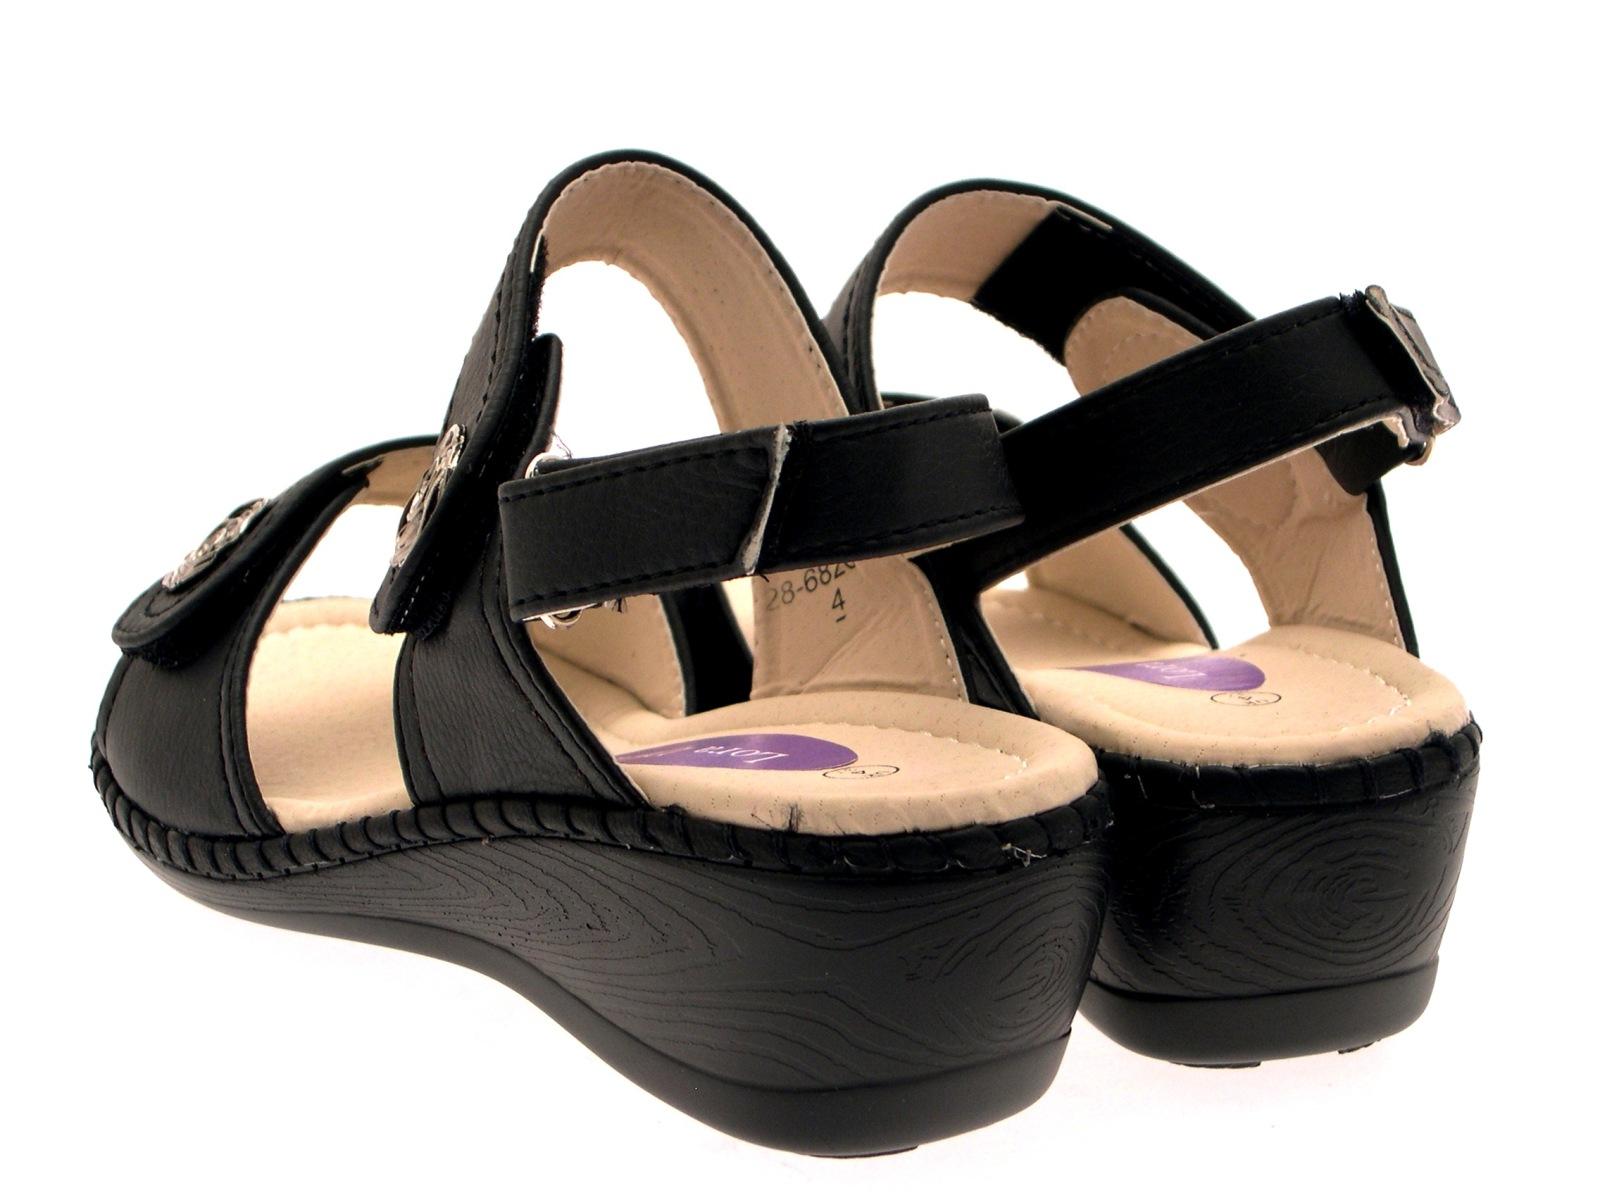 Luxury Womenu0026#39;s Flat Velcro Strap Sandal By Vionic At Walk In Style